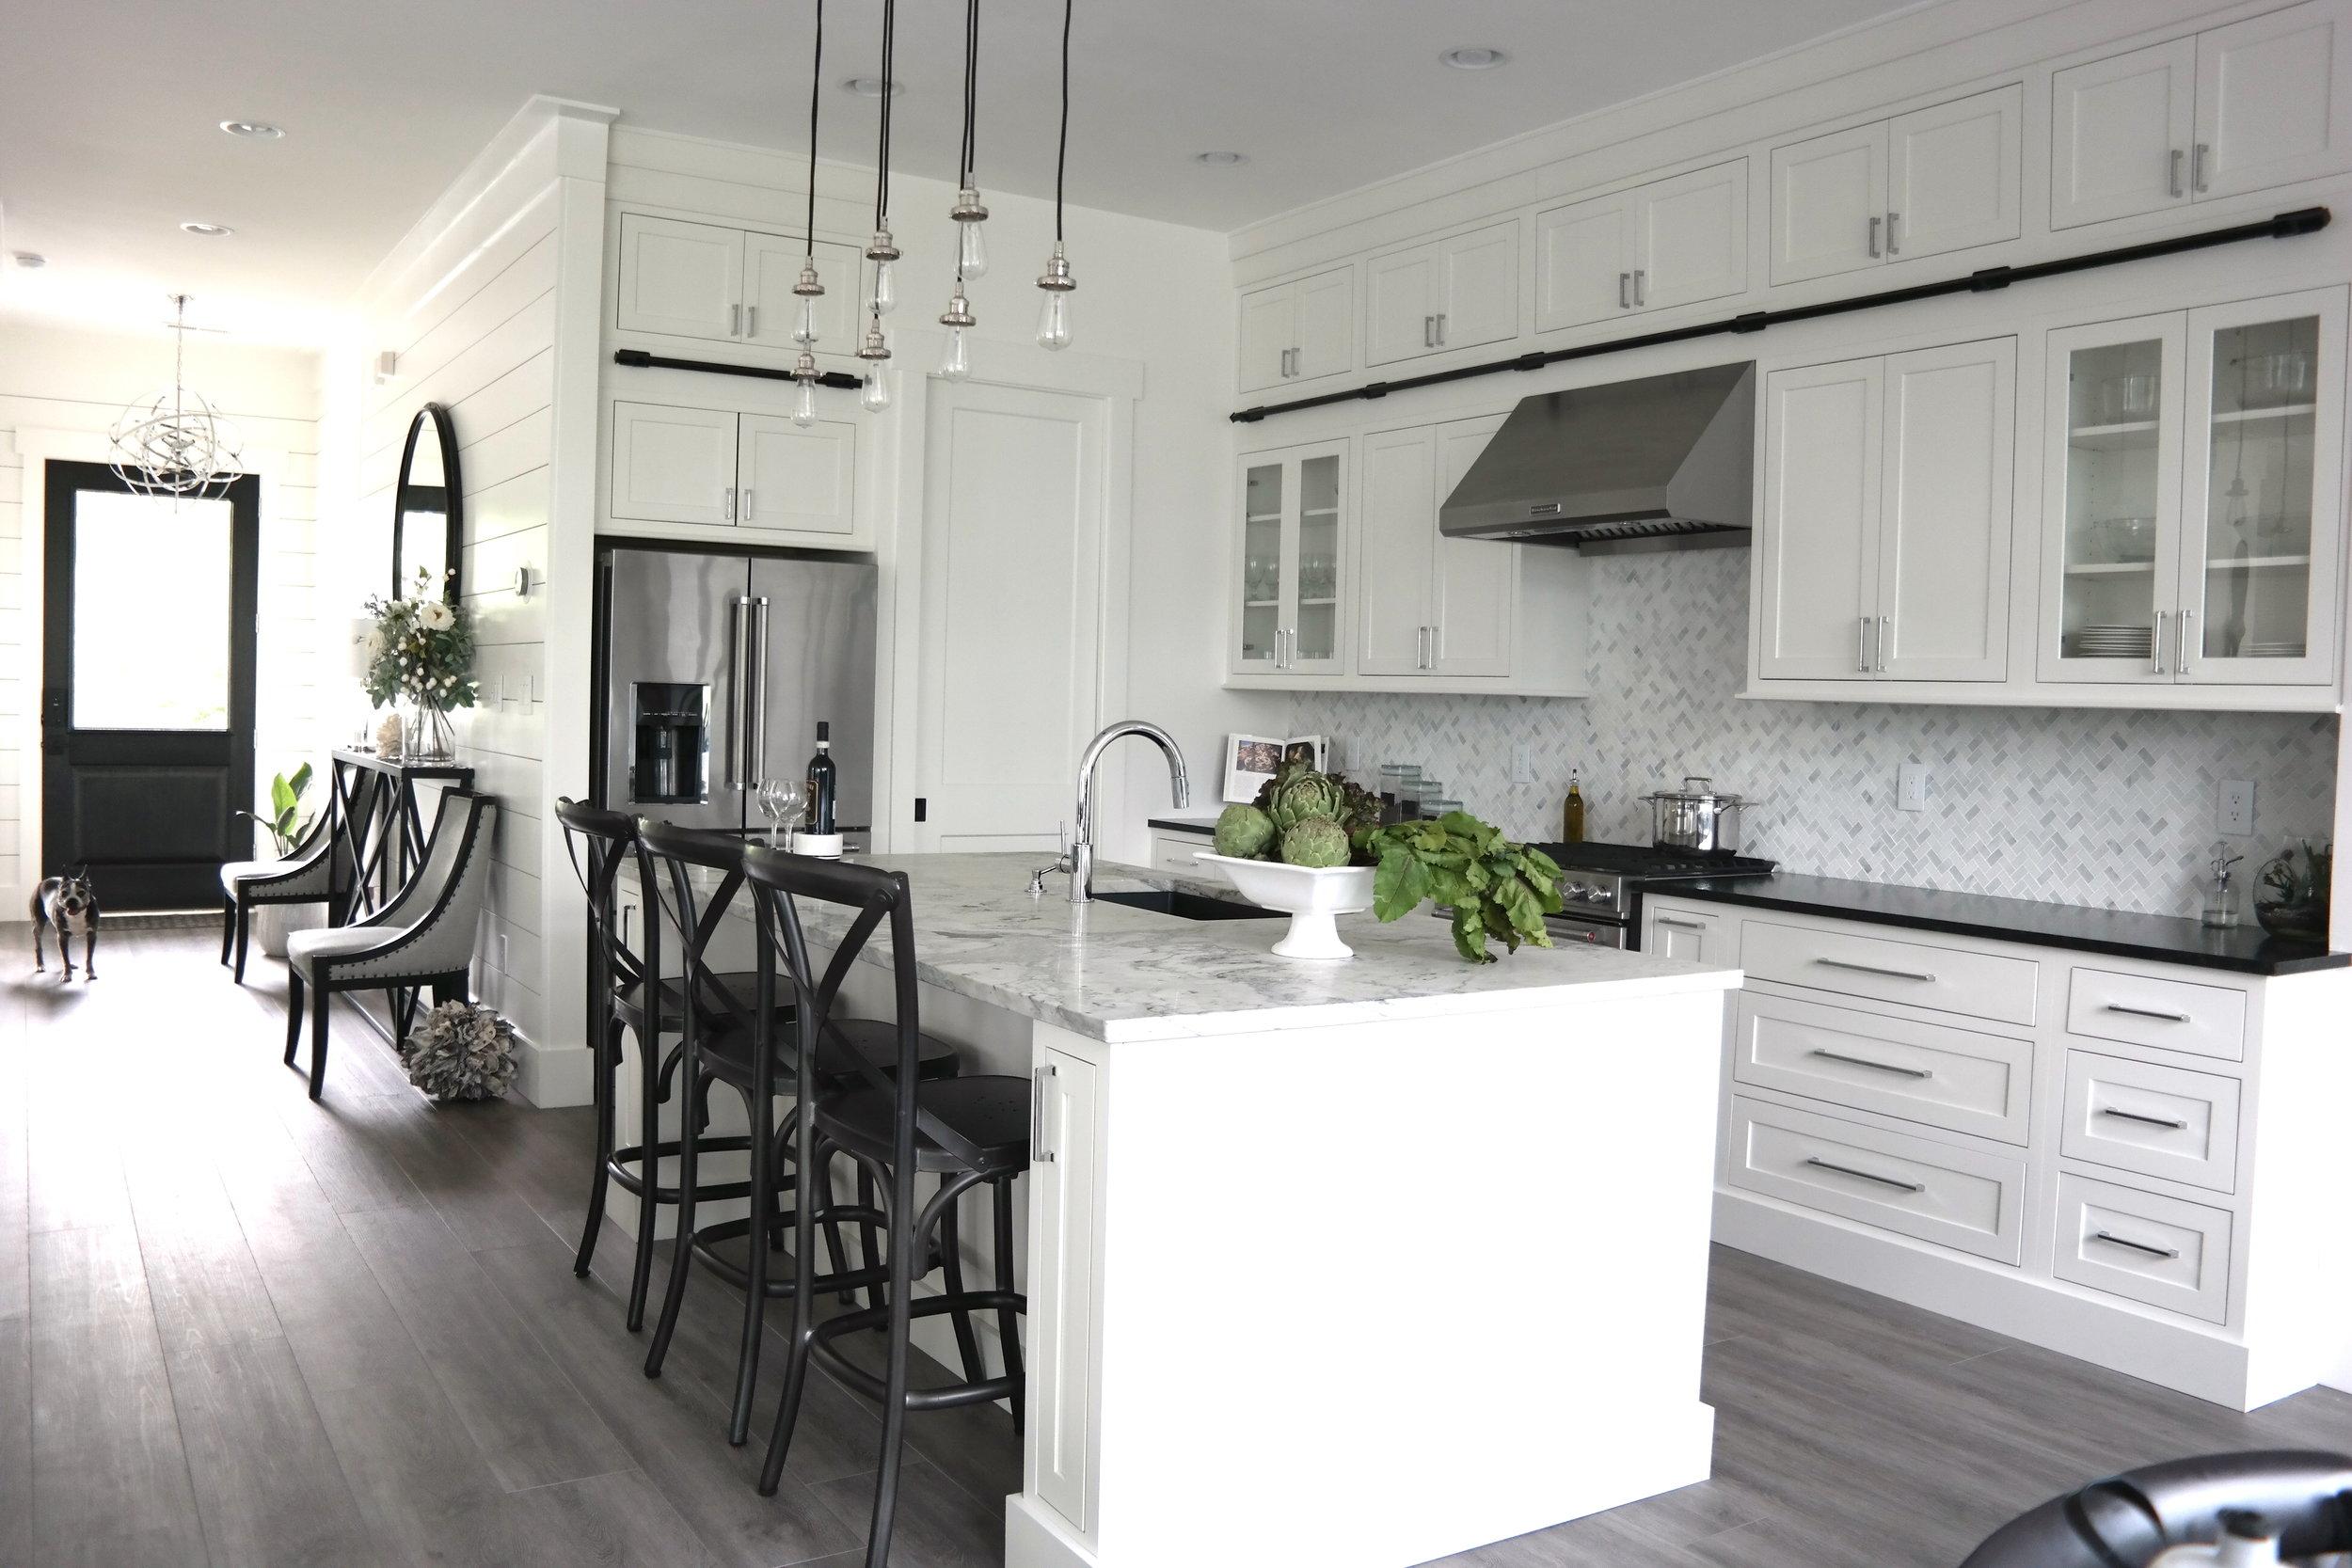 New Construction - Residential Design | Fenwick Island, DE